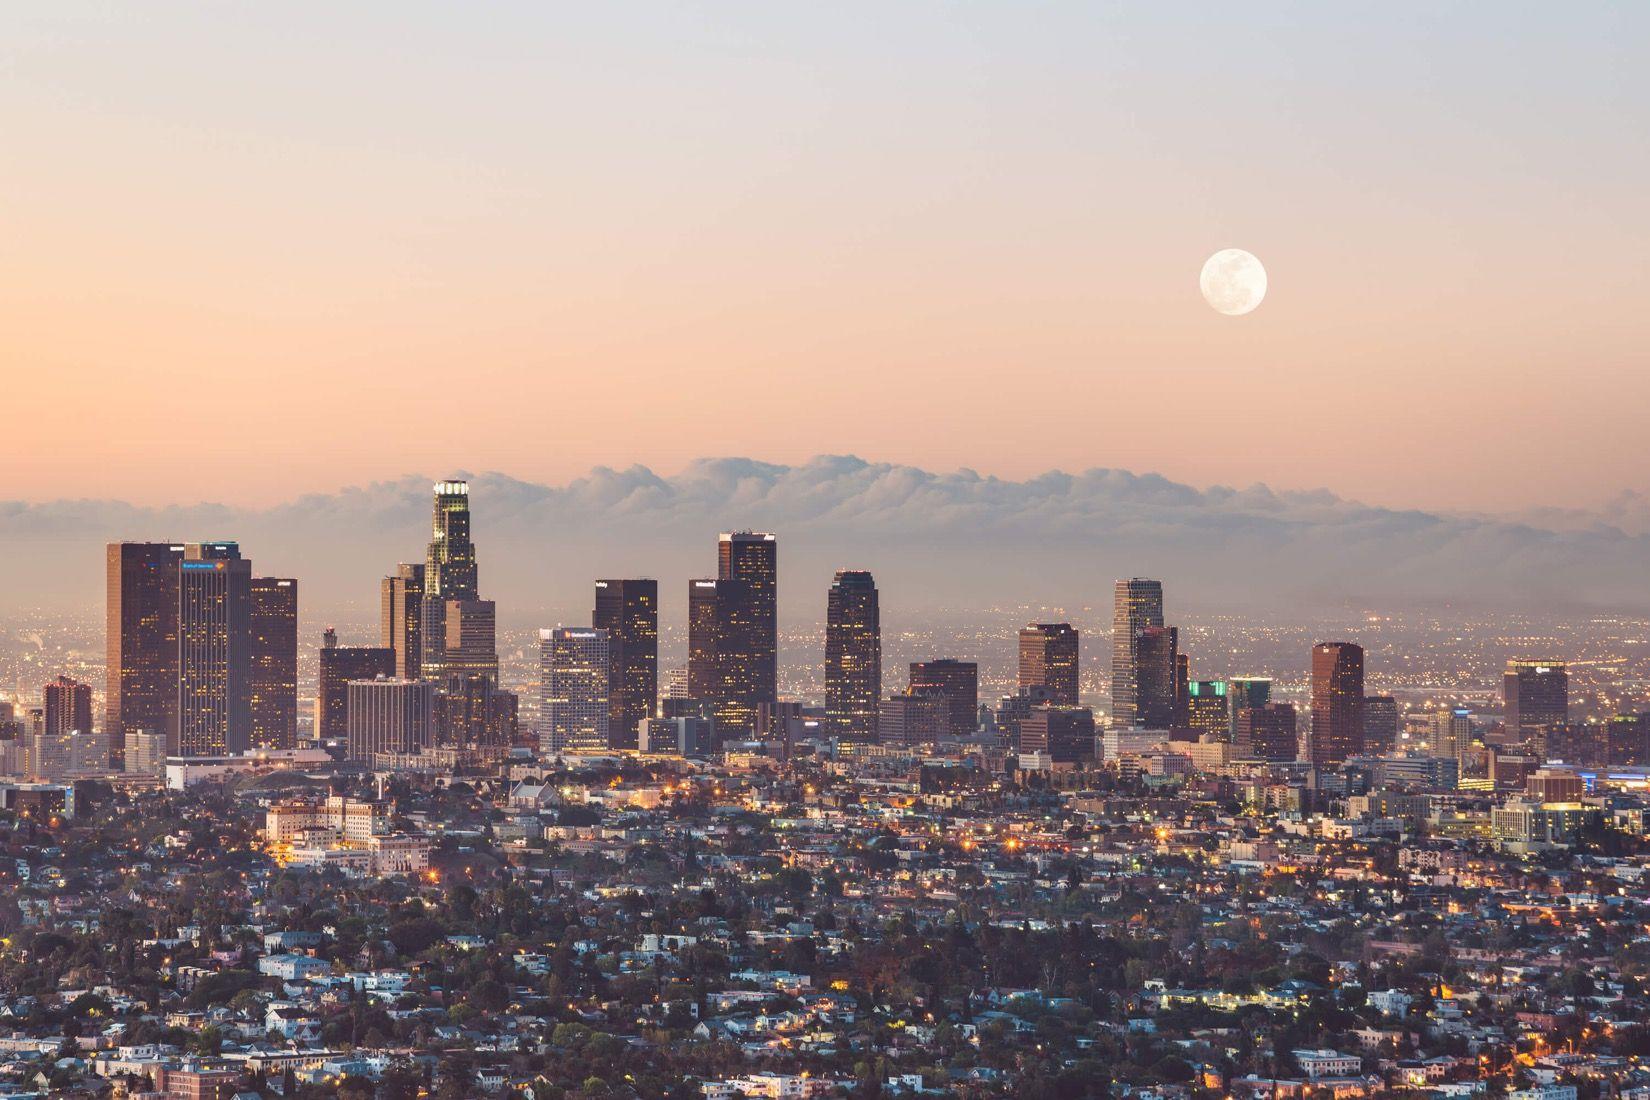 Pin By A M Y J O N E S On Decor Los Angeles Skyline Los Angeles Photography Los Angeles Wallpaper